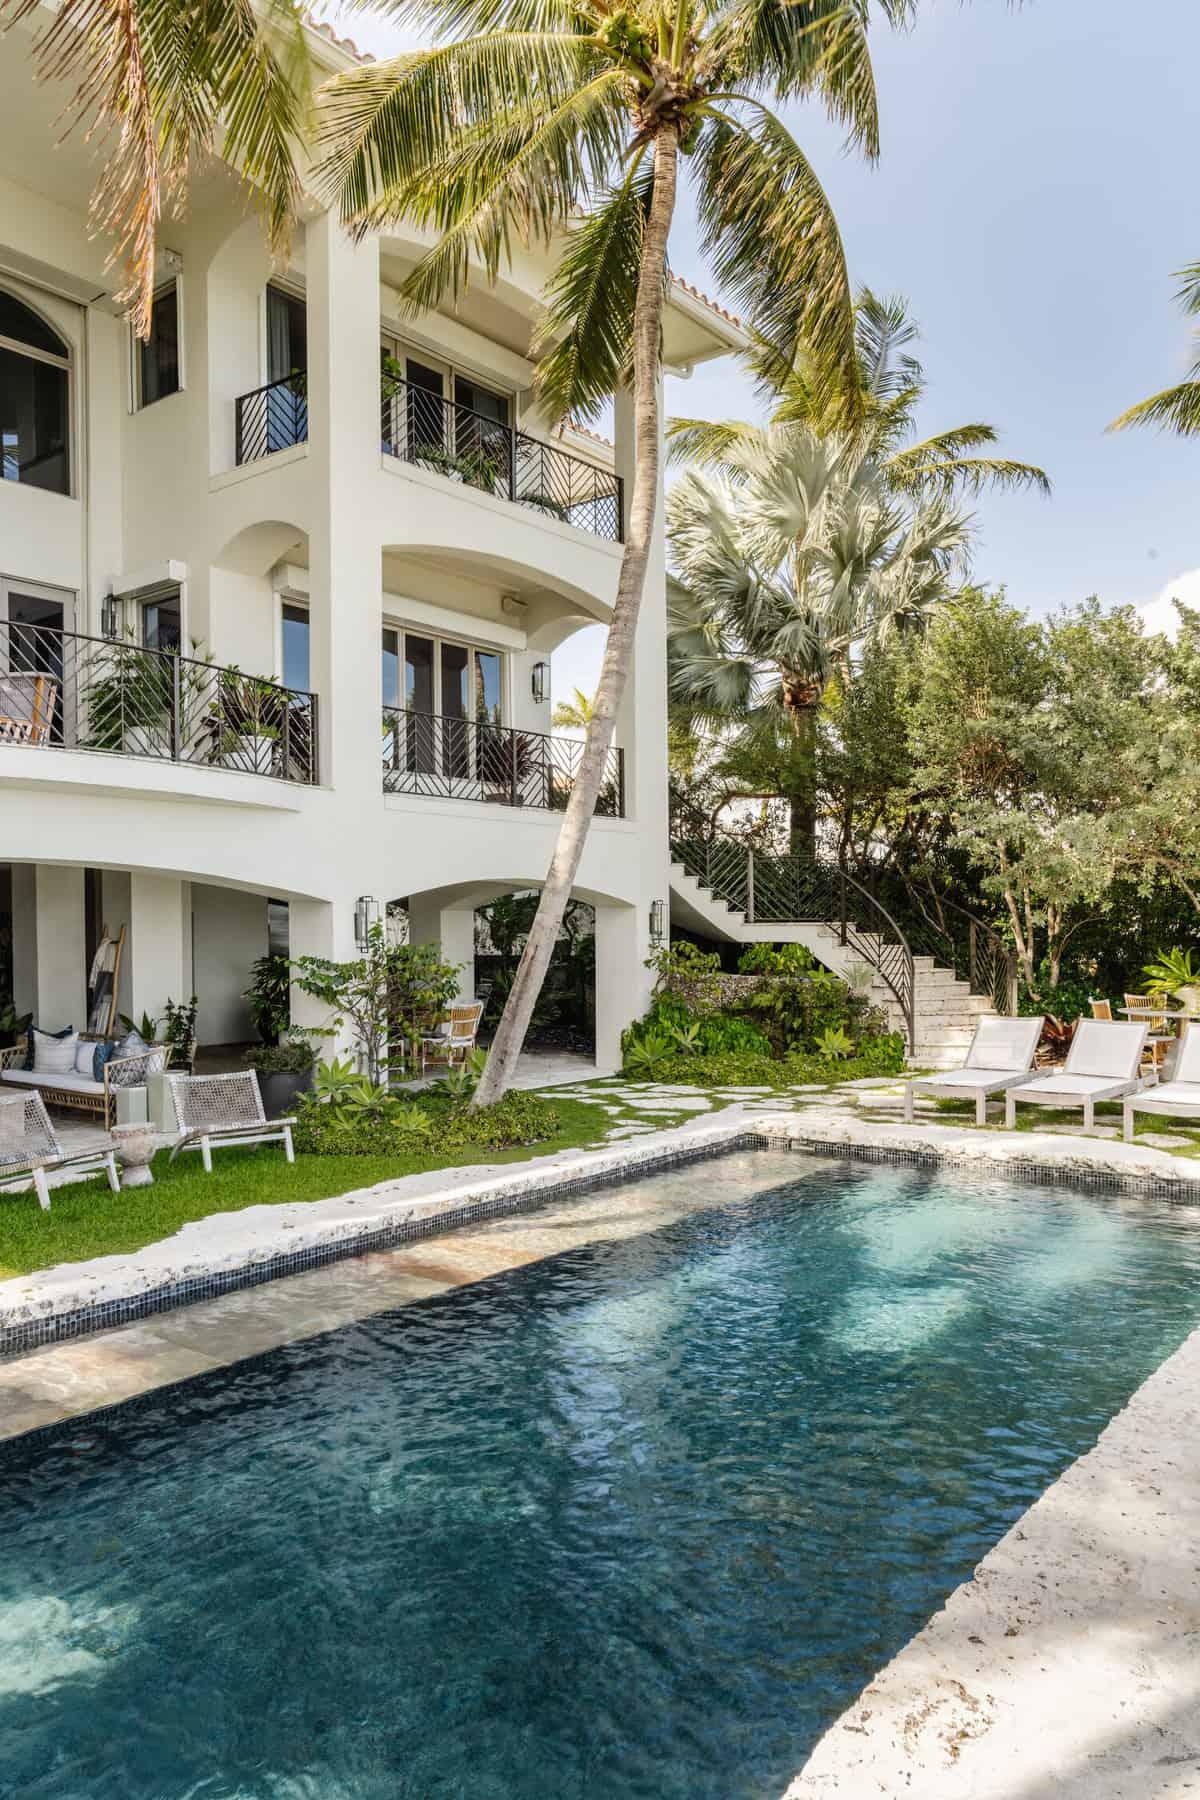 hacienda-spanish-style-house-swimming-pool